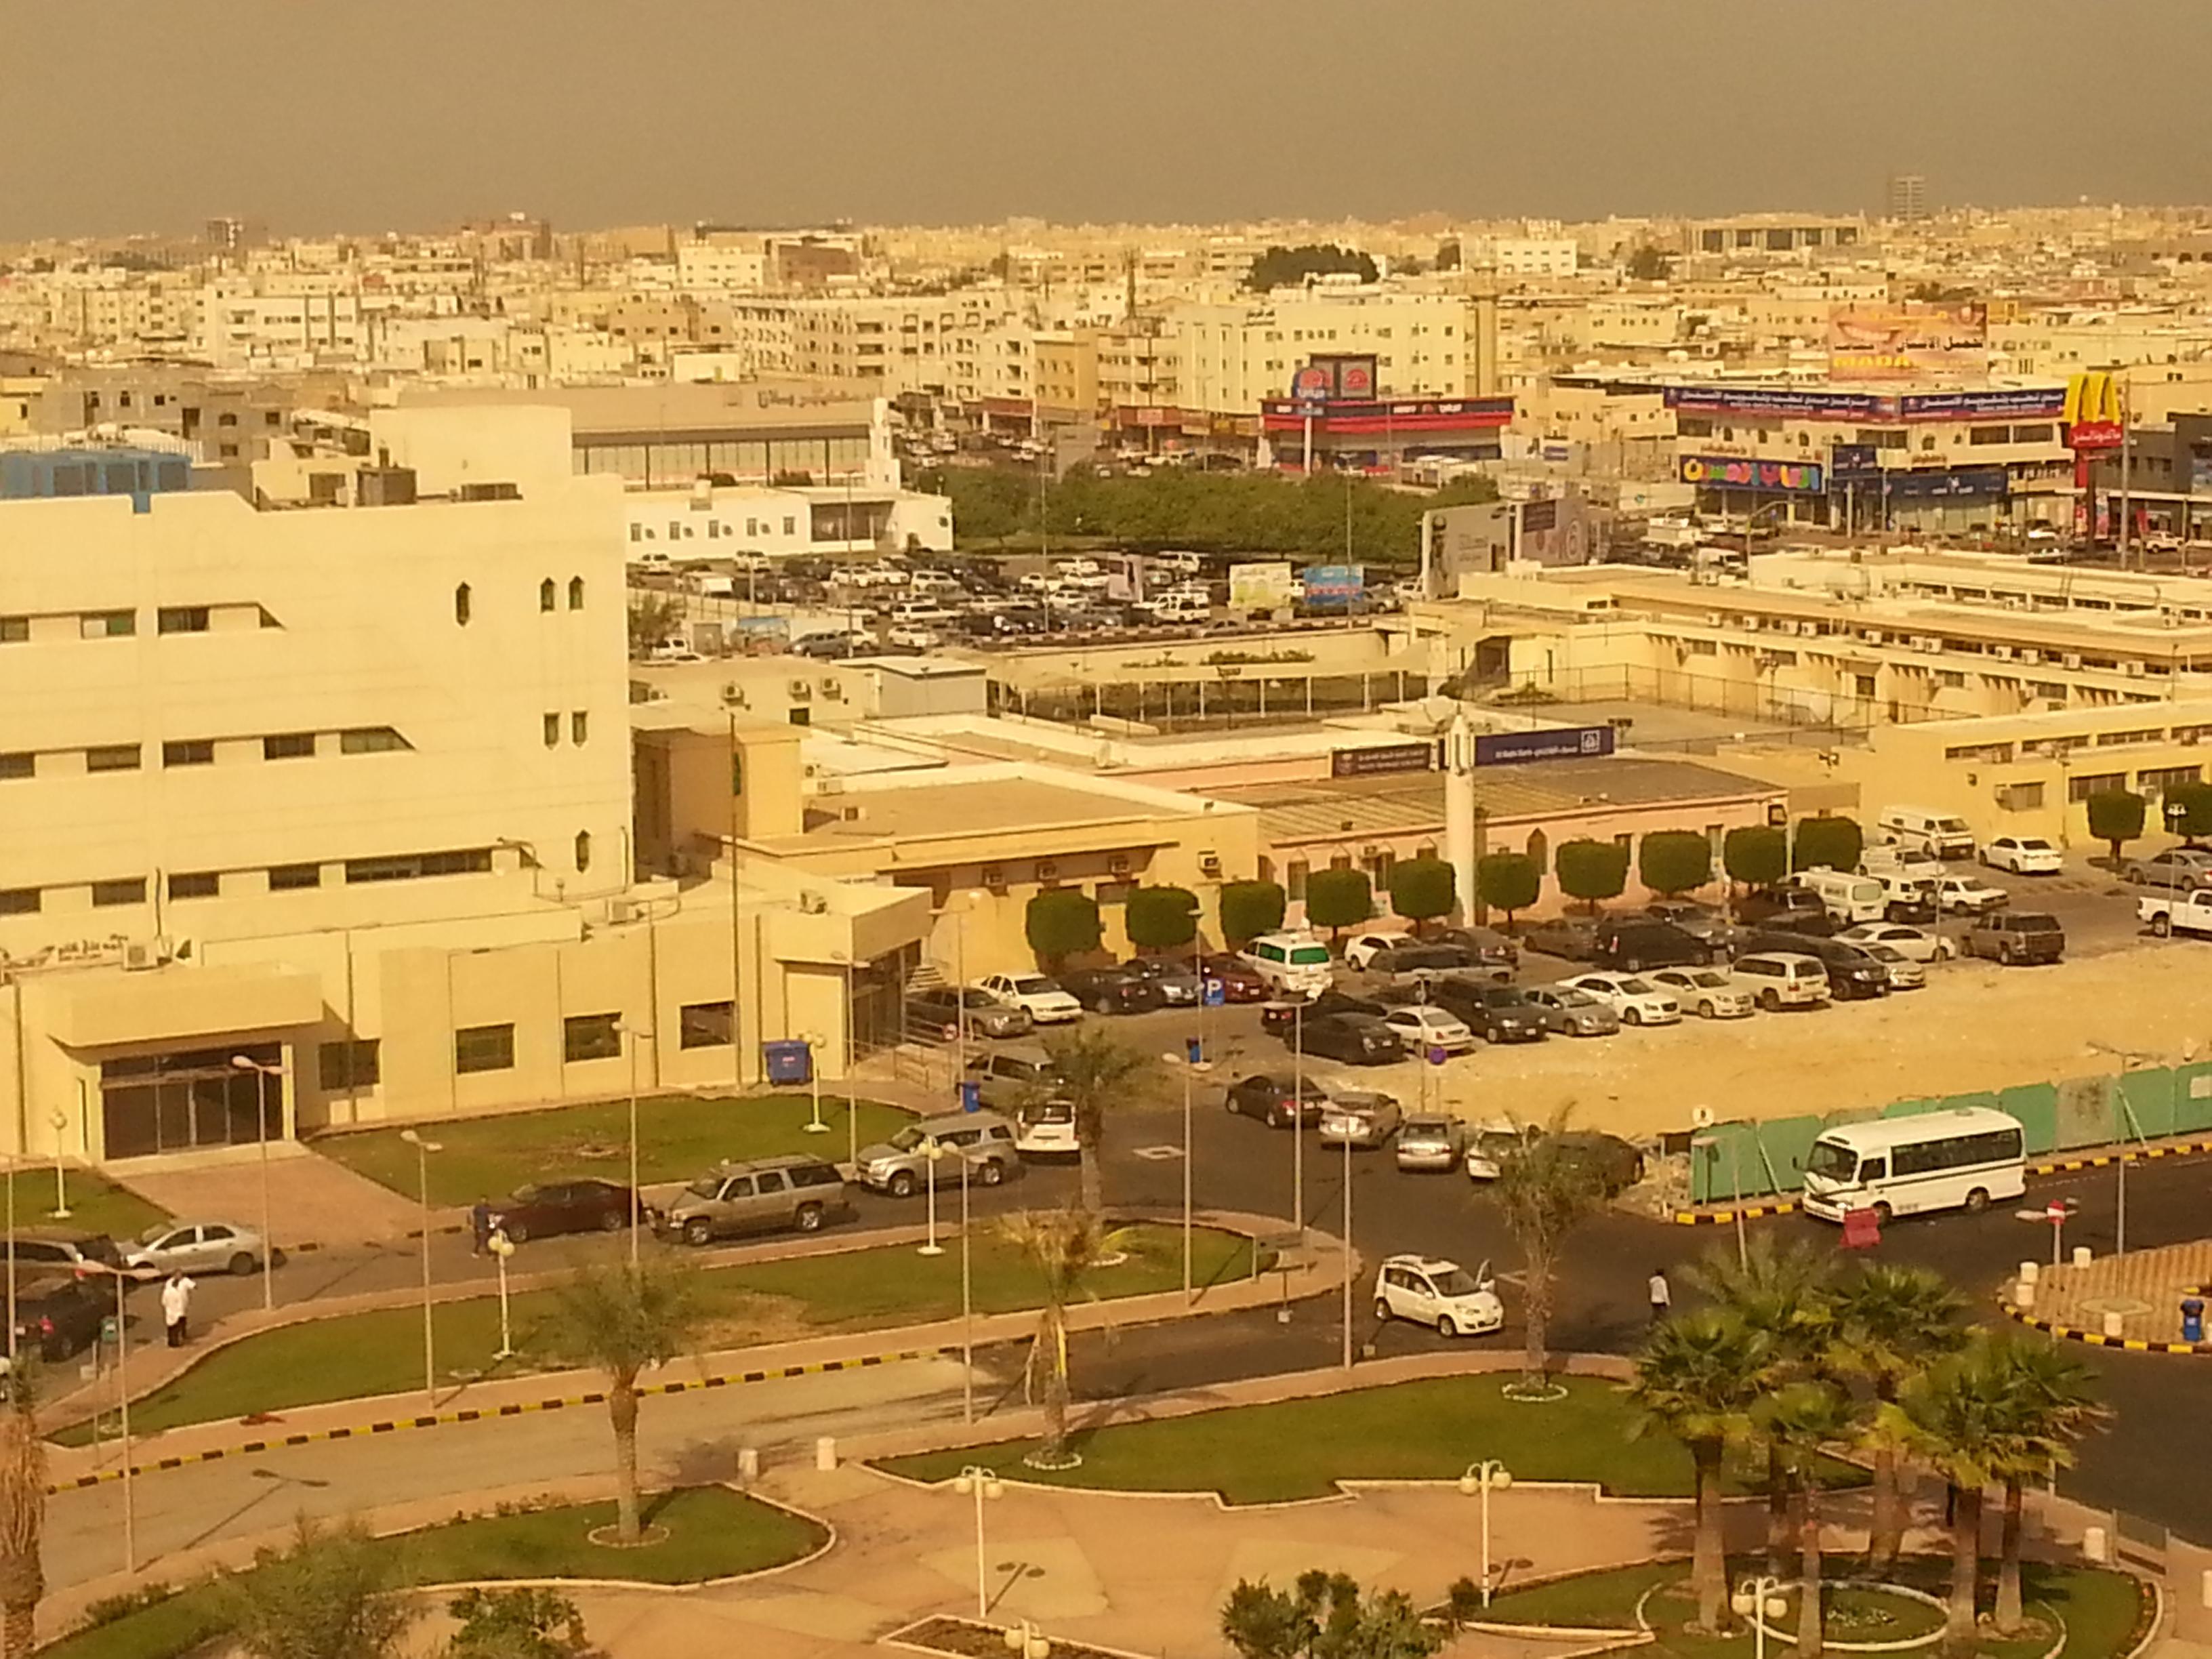 Dammam wikipedia hospitals and medical centersedit publicscrutiny Images